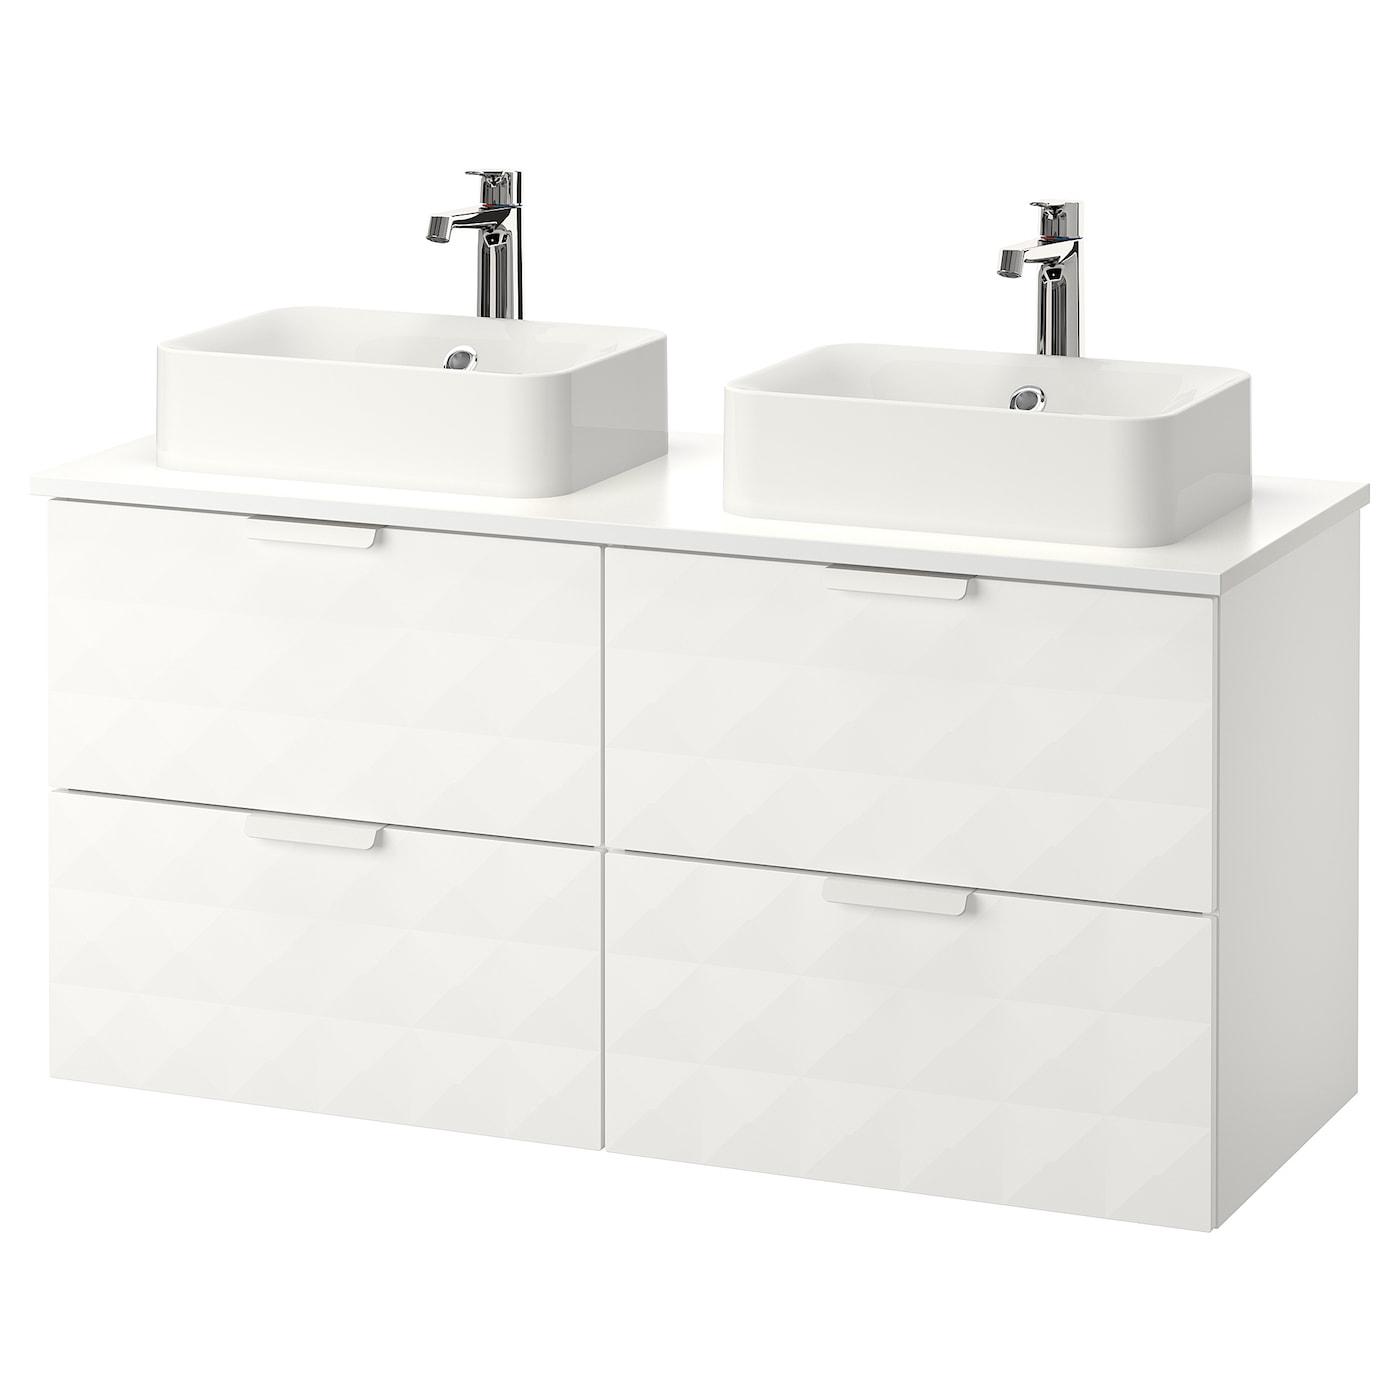 meuble lavabo salle de bain ikea. Black Bedroom Furniture Sets. Home Design Ideas